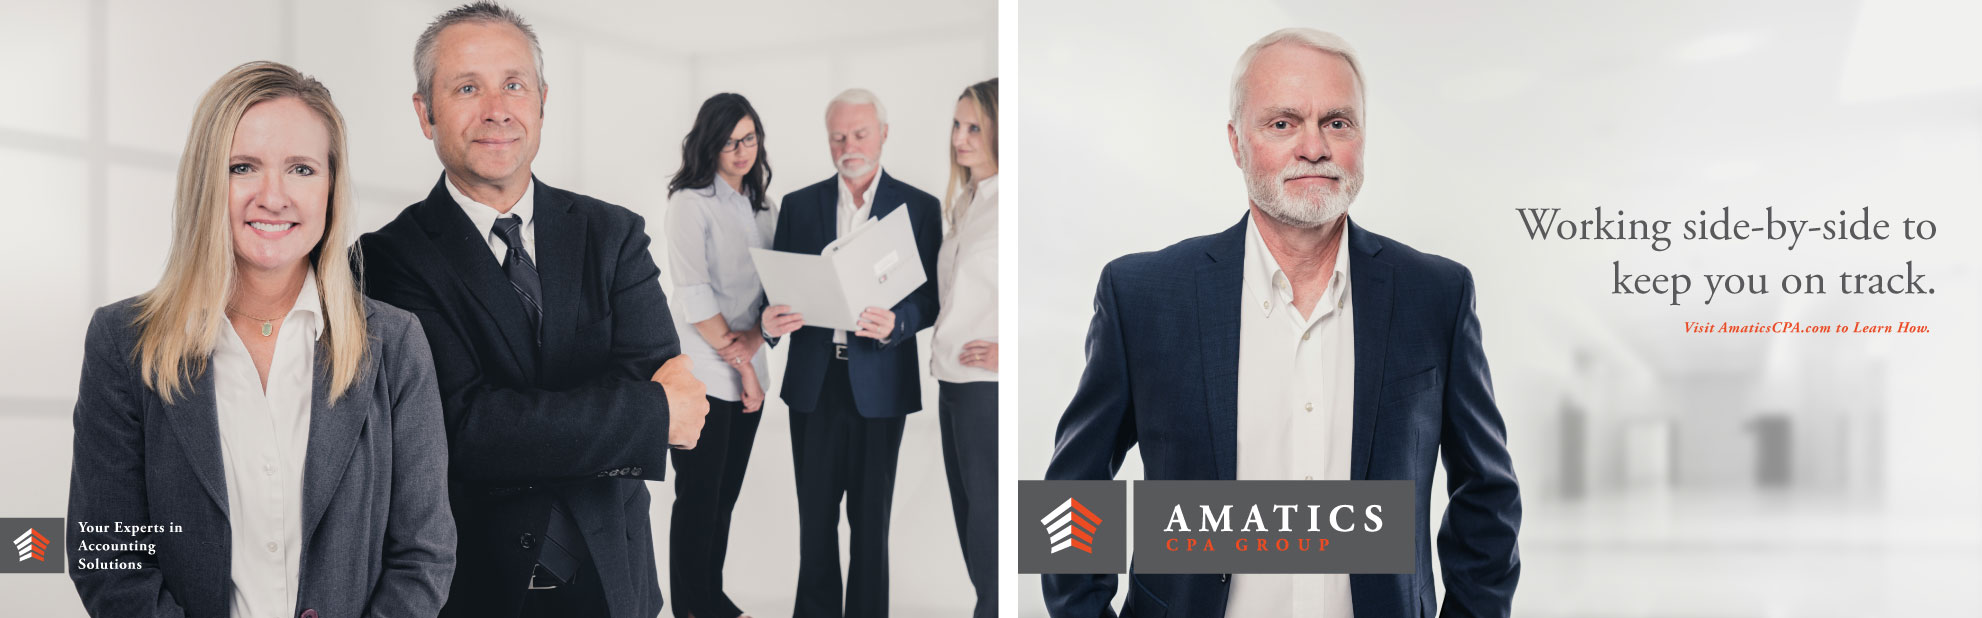 Amatics CPA Group